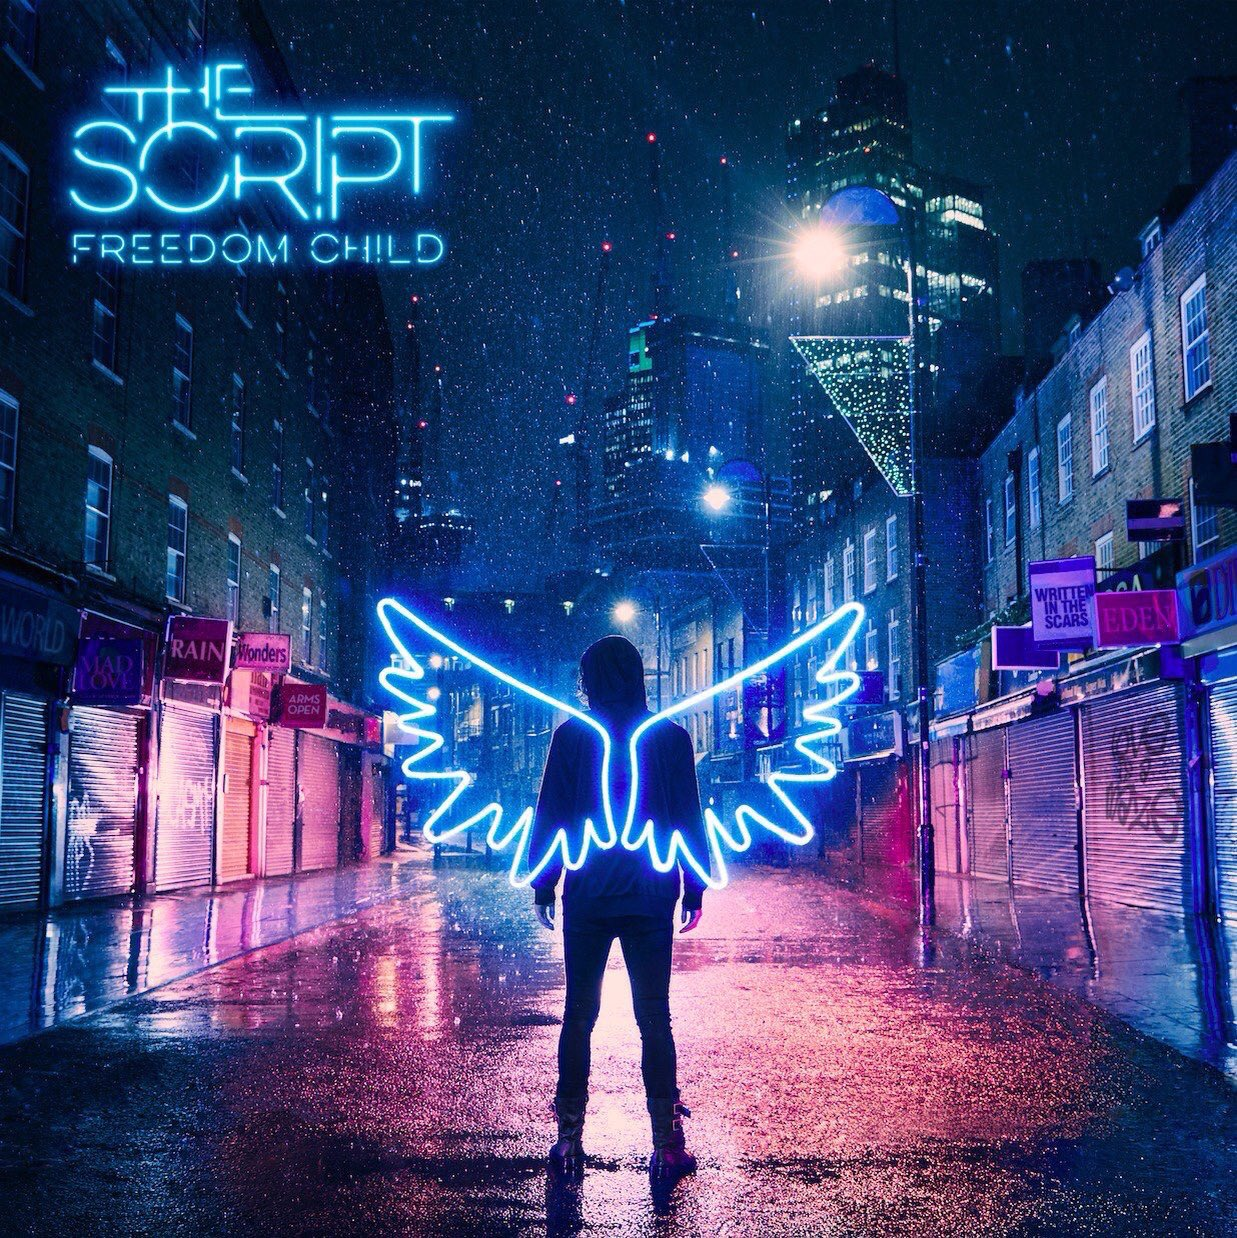 RT @ScriptLyric: #FreedomChild is the second biggest album worldwide on iTunes right now! https://t.co/uMQktMqZ6l